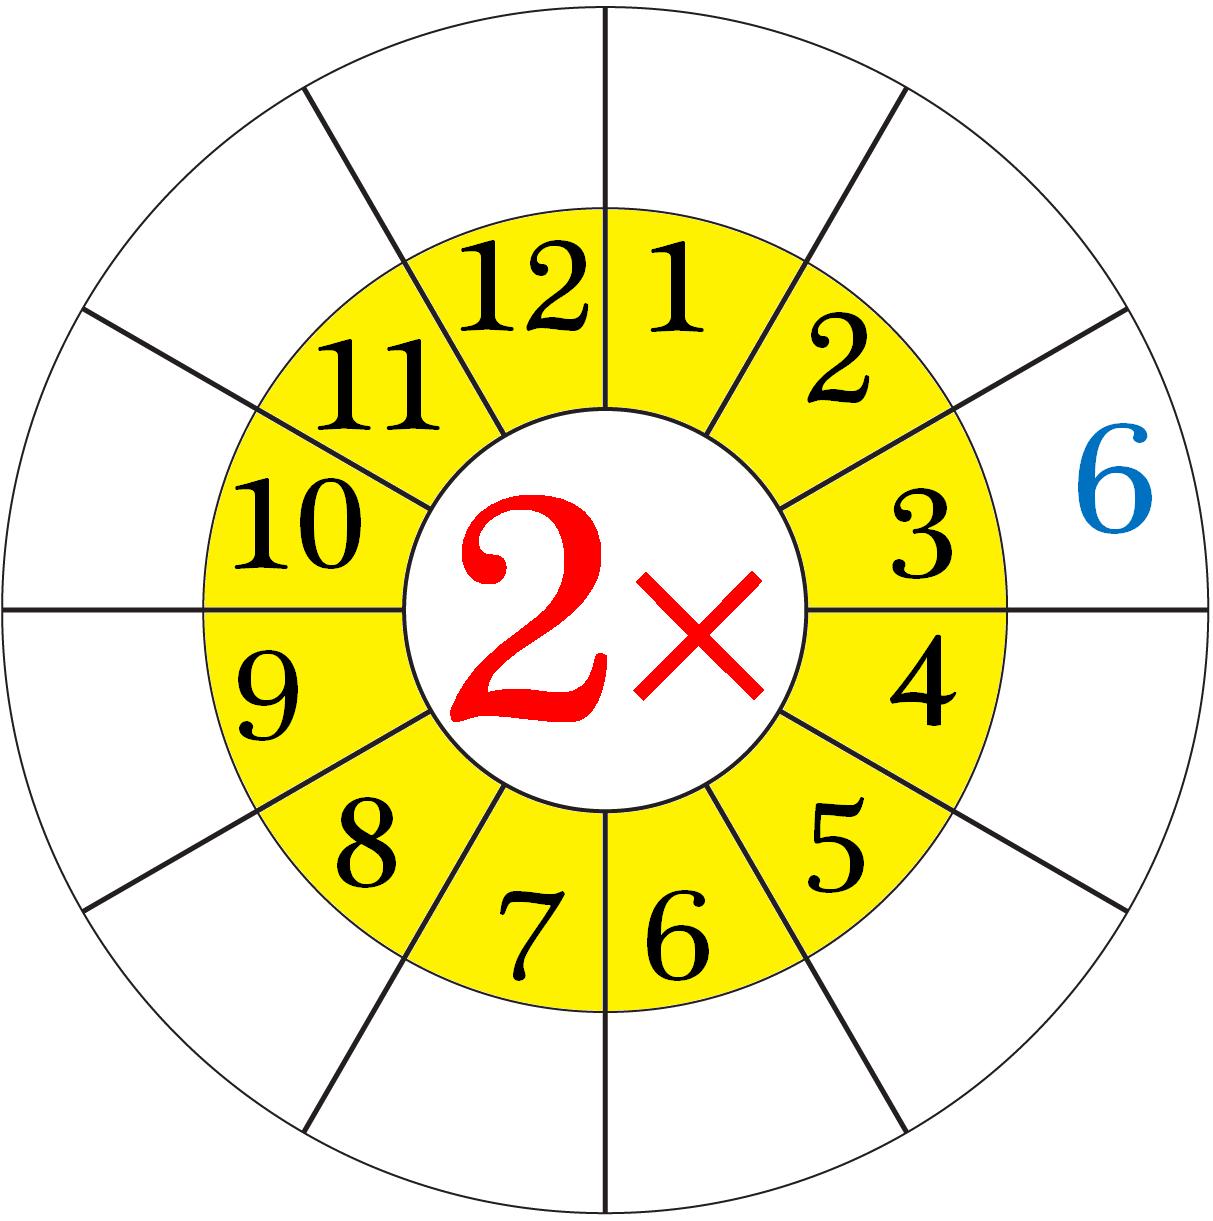 Worksheet On Multiplication Table Of 2